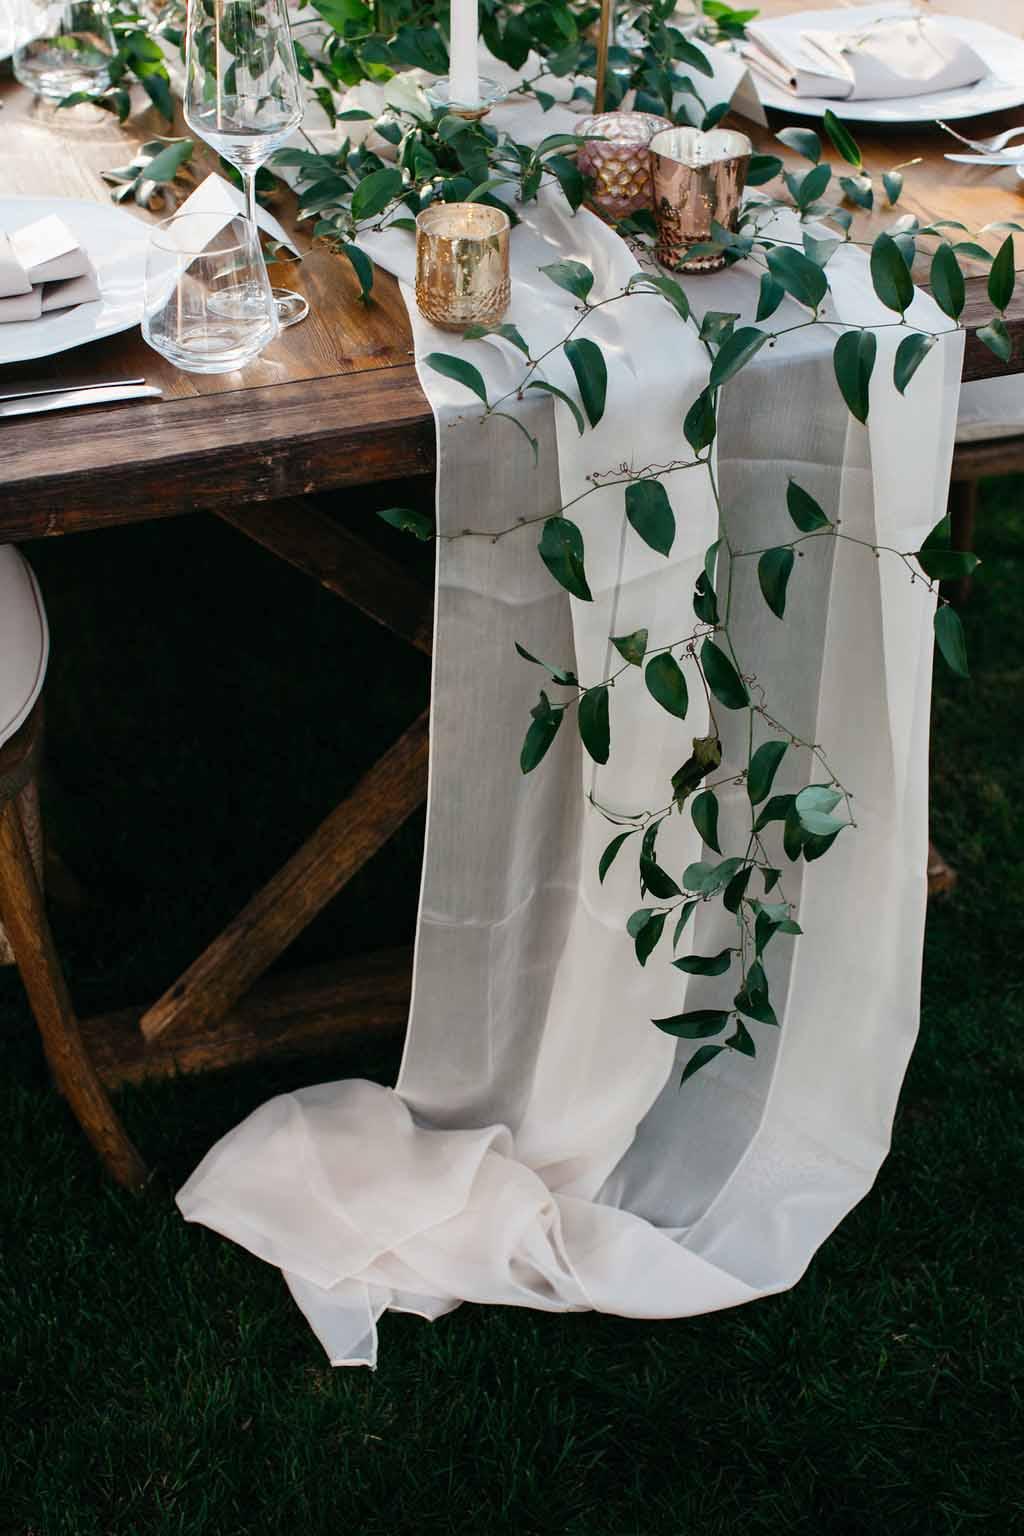 Greenery trailing down draped wooden table - Elegant Seattle Garden Wedding by Flora Nova Design Seattle